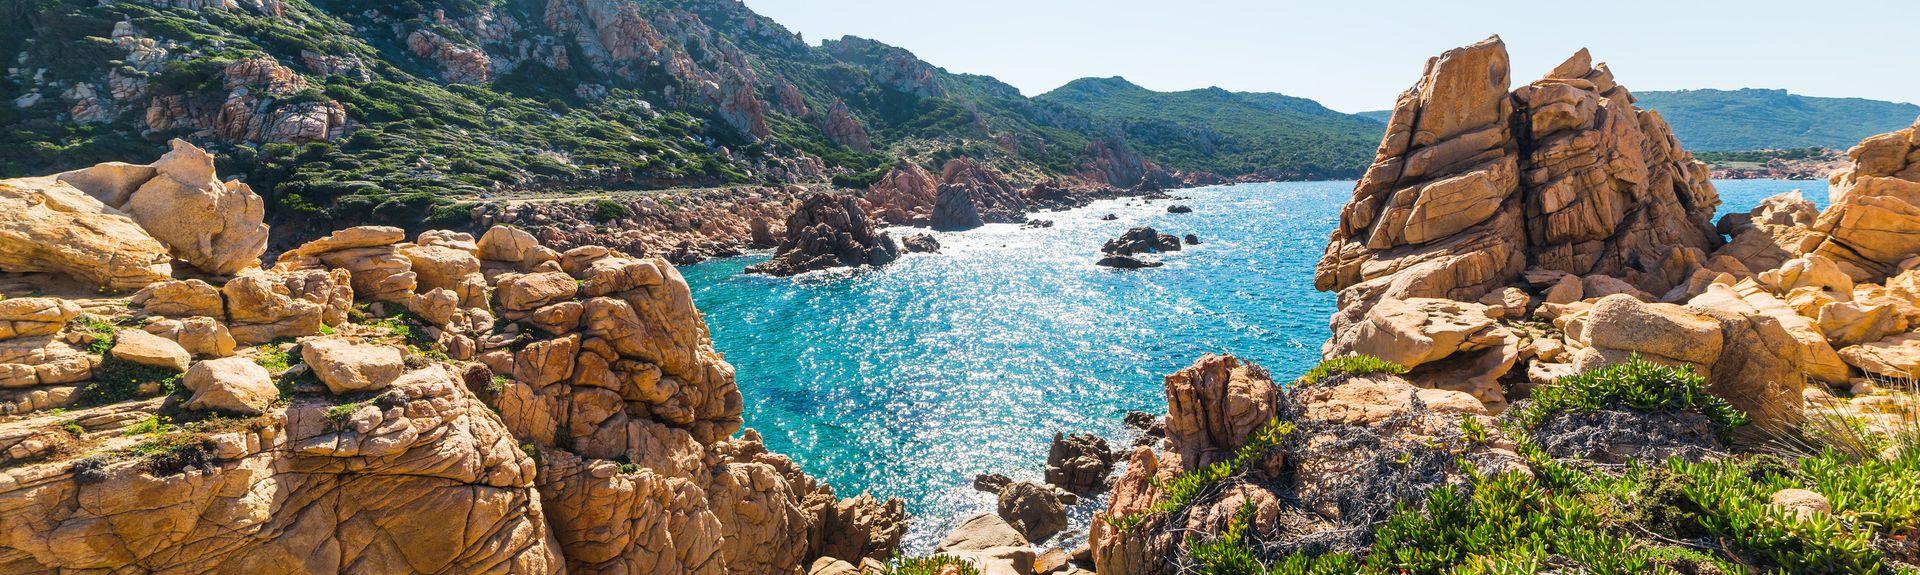 Costa Paradiso, Sardegna, Italia